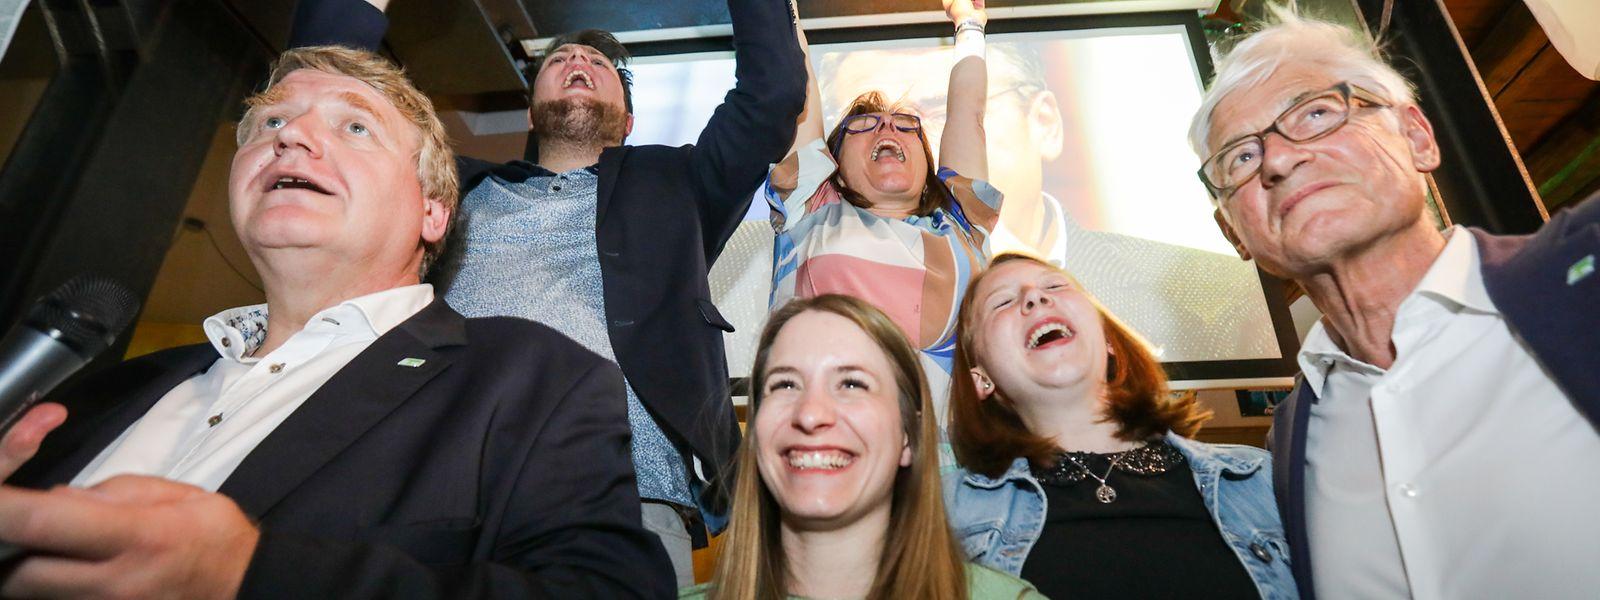 So sehen Wahlsieger aus. Déi Gréng können sich zum dritten Mal nacheinander steigern.